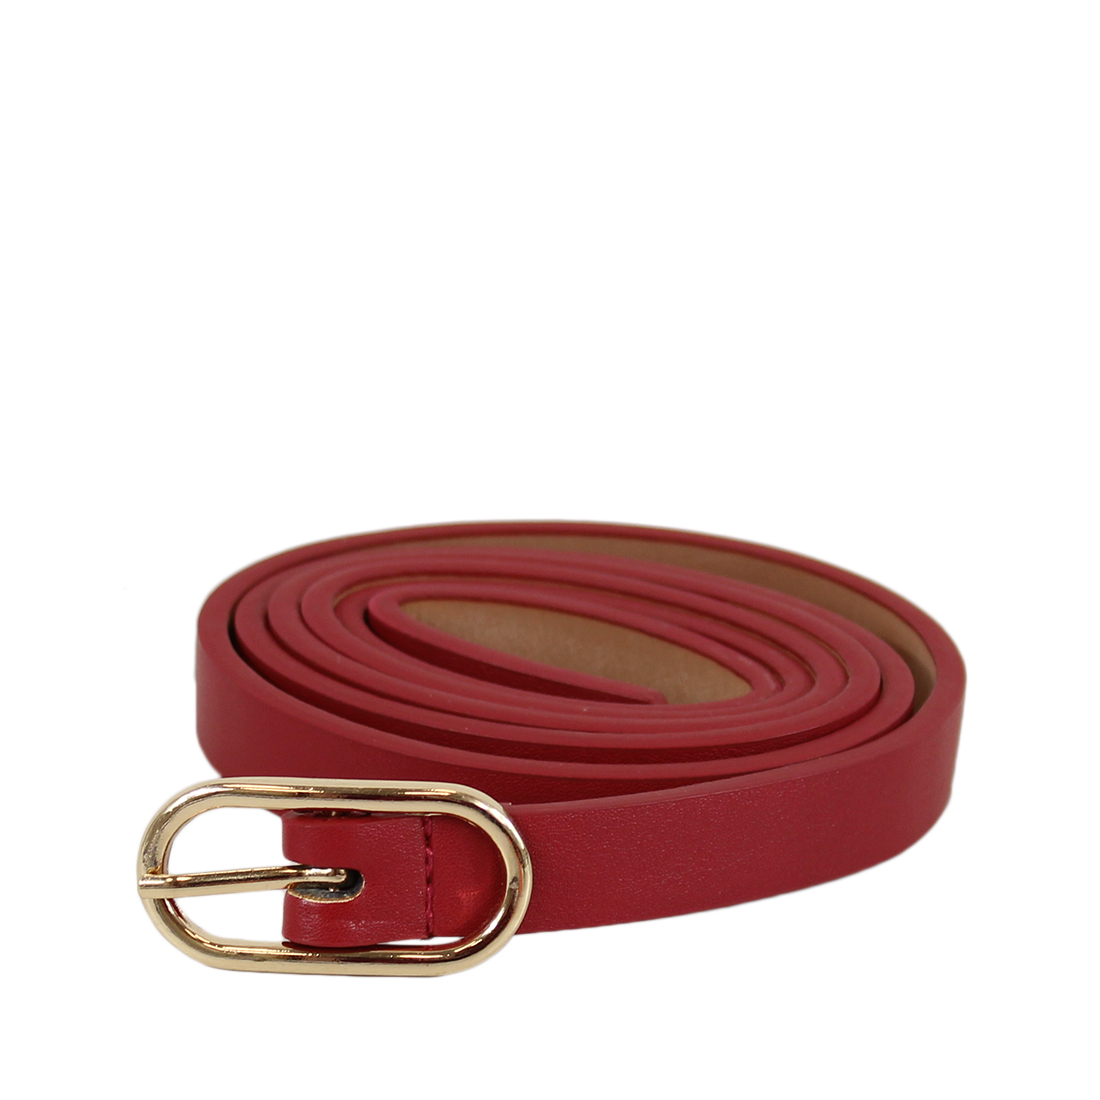 Plain super slim belt with oval gold buckle